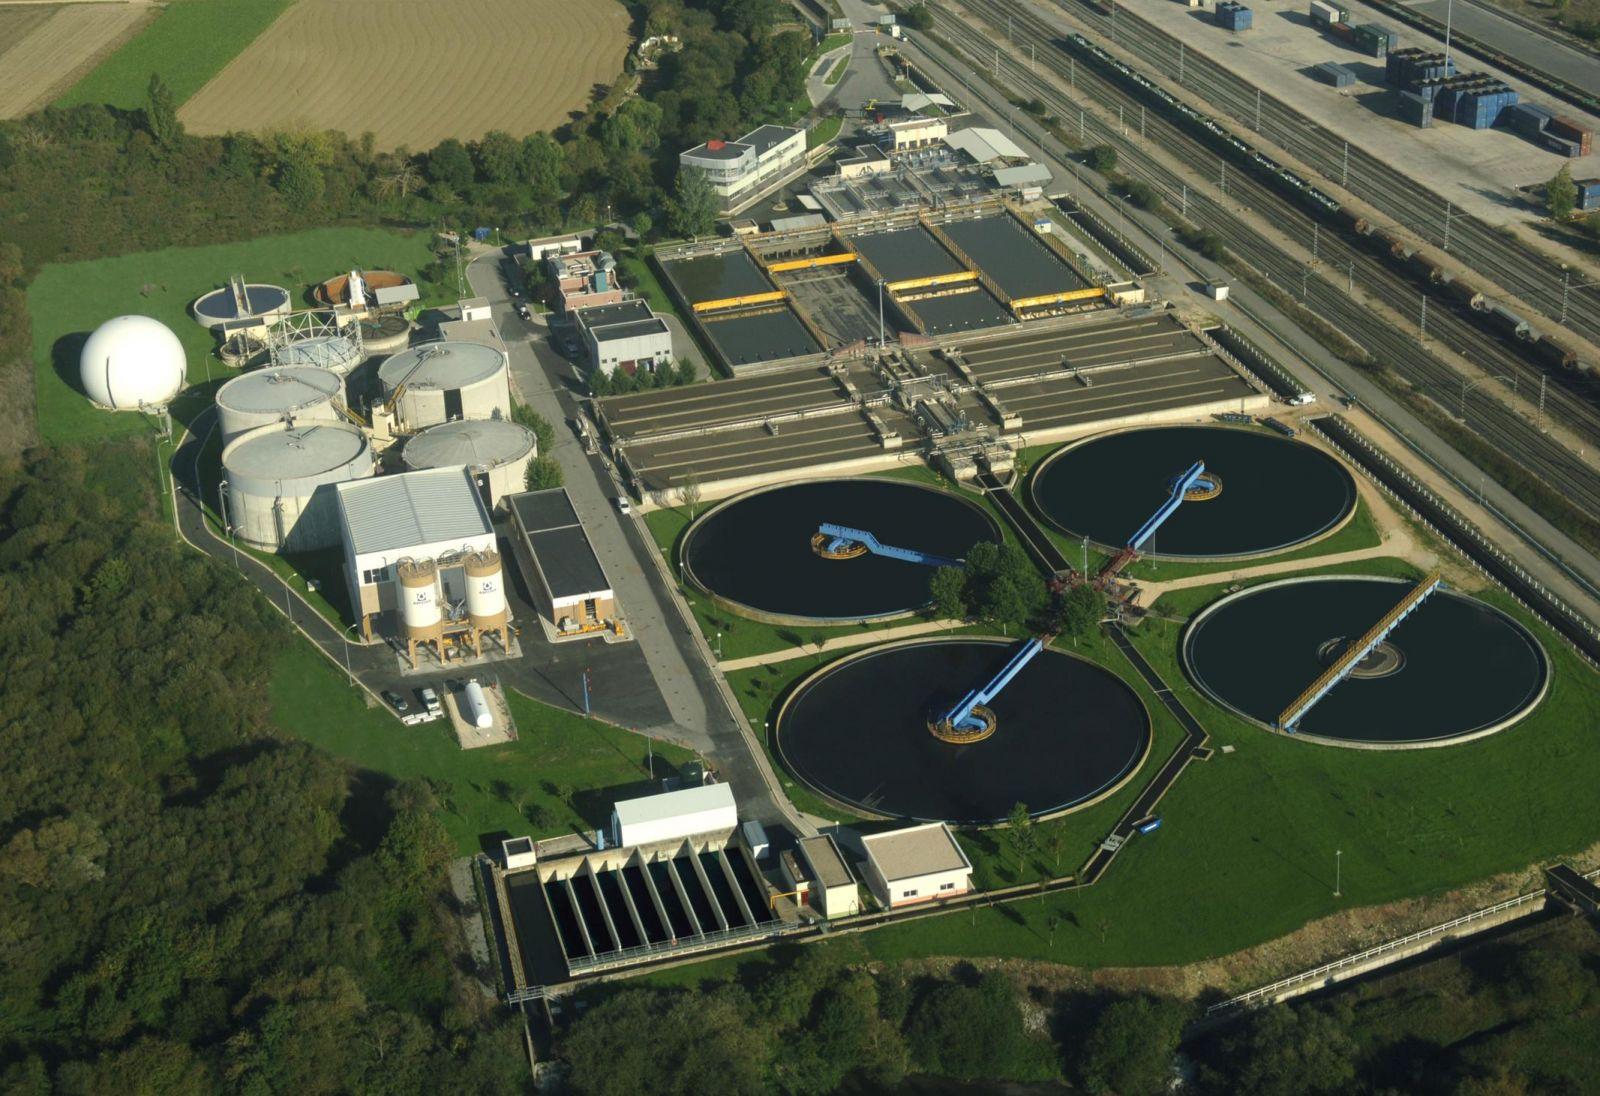 Curso de explotaci n de edar 39 s urbanas for Depuradora aguas residuales